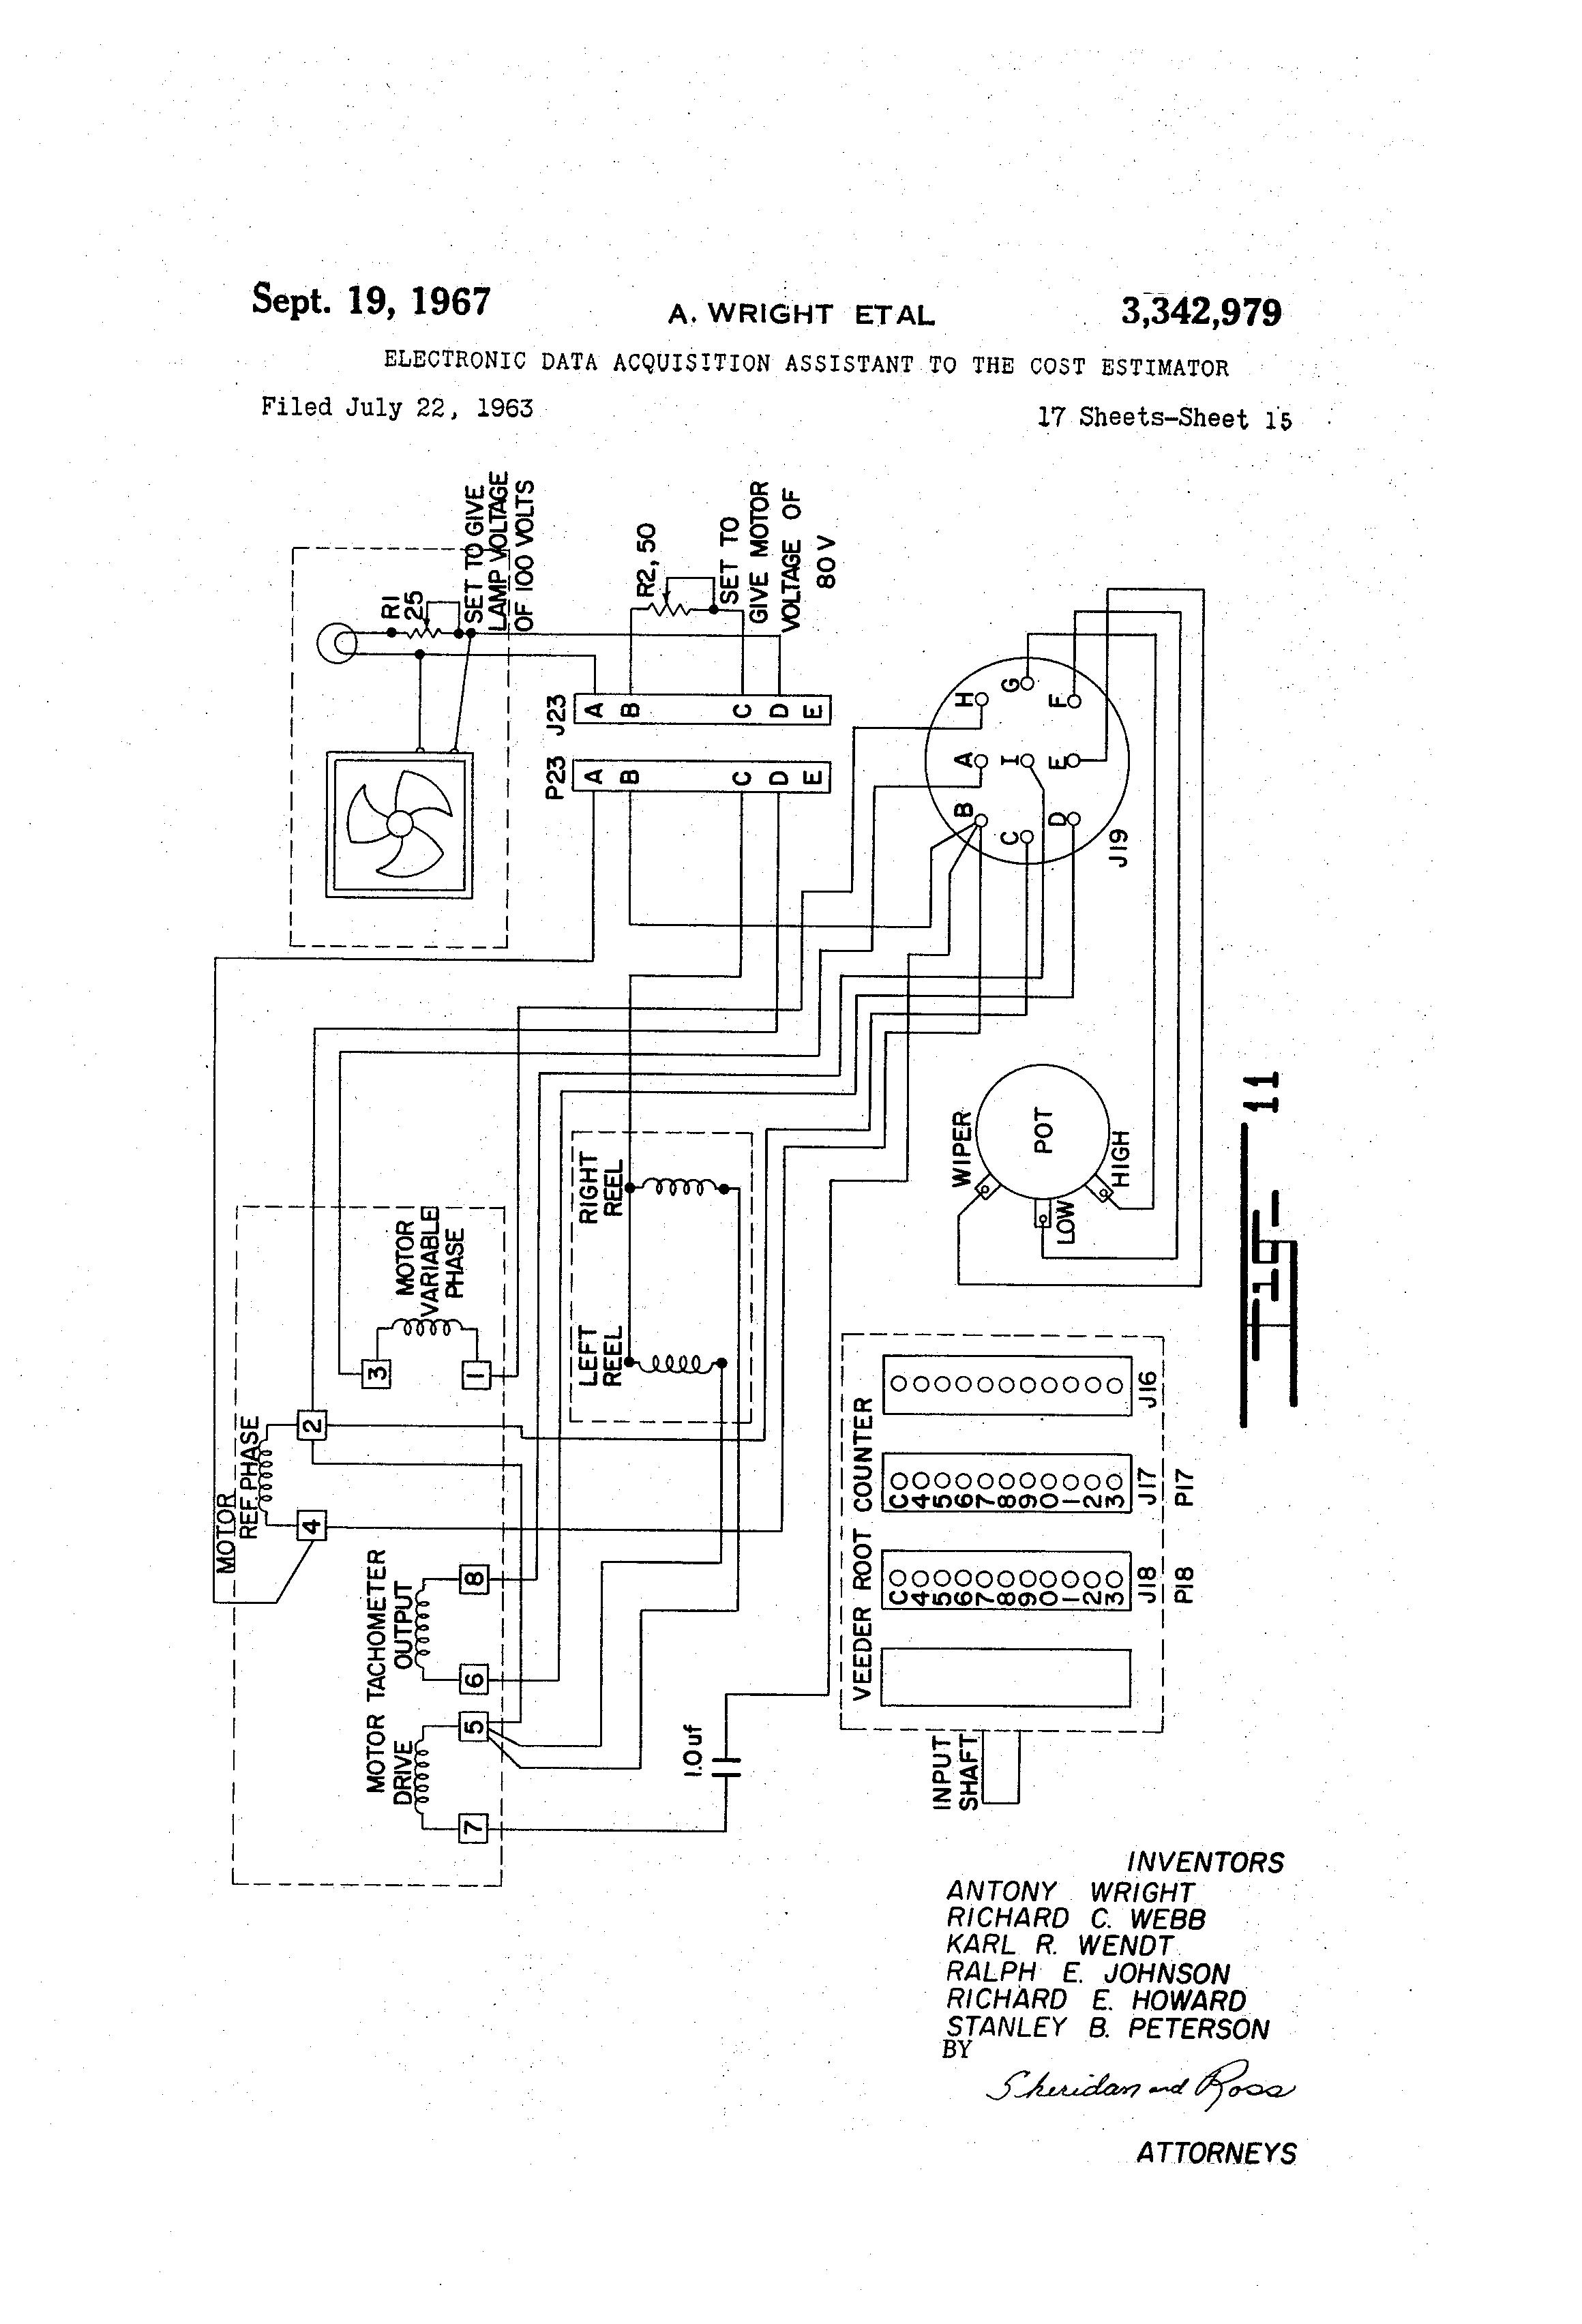 480v welding receptacle wiring diagram keystone springdale wiring 30 Amp Plug Wiring Diagram  Fuel Gauge Wiring Diagram 125V Plug Wiring Diagram Arc Welder Wiring Diagram